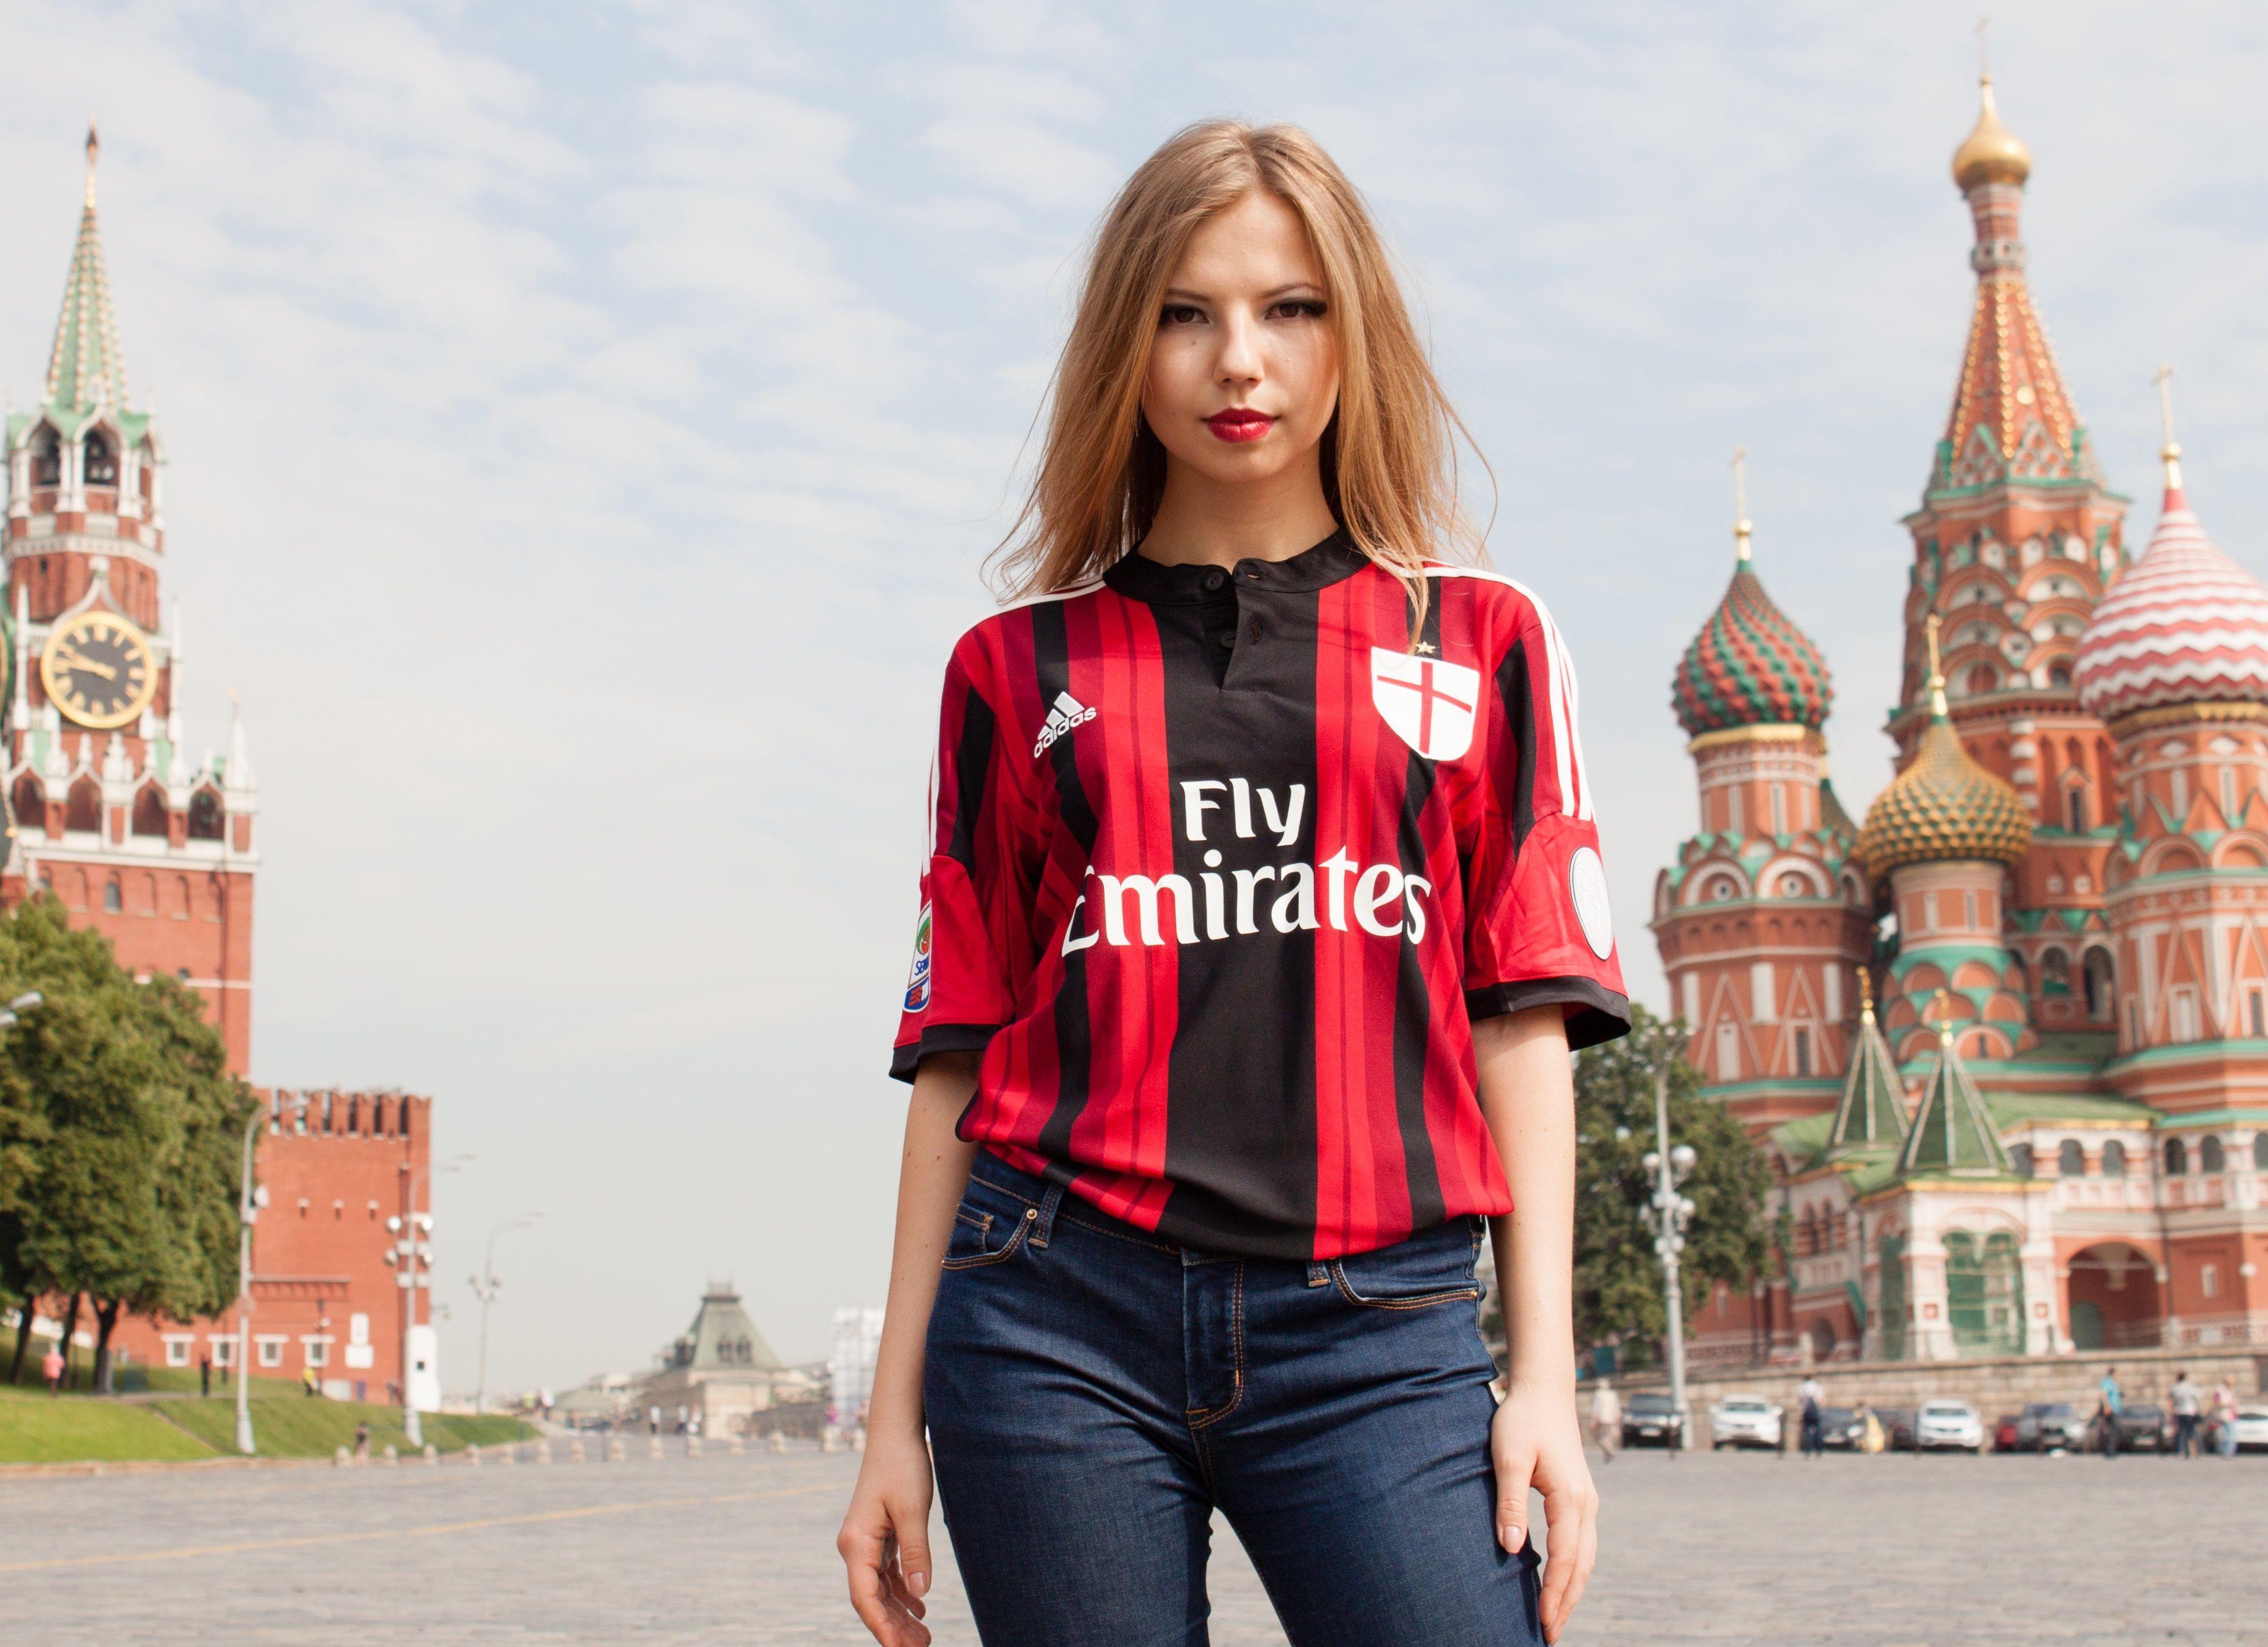 New AC Milan home kit 2014/15. Rosso-Neri , diabli rossi etc. at the Red Square.